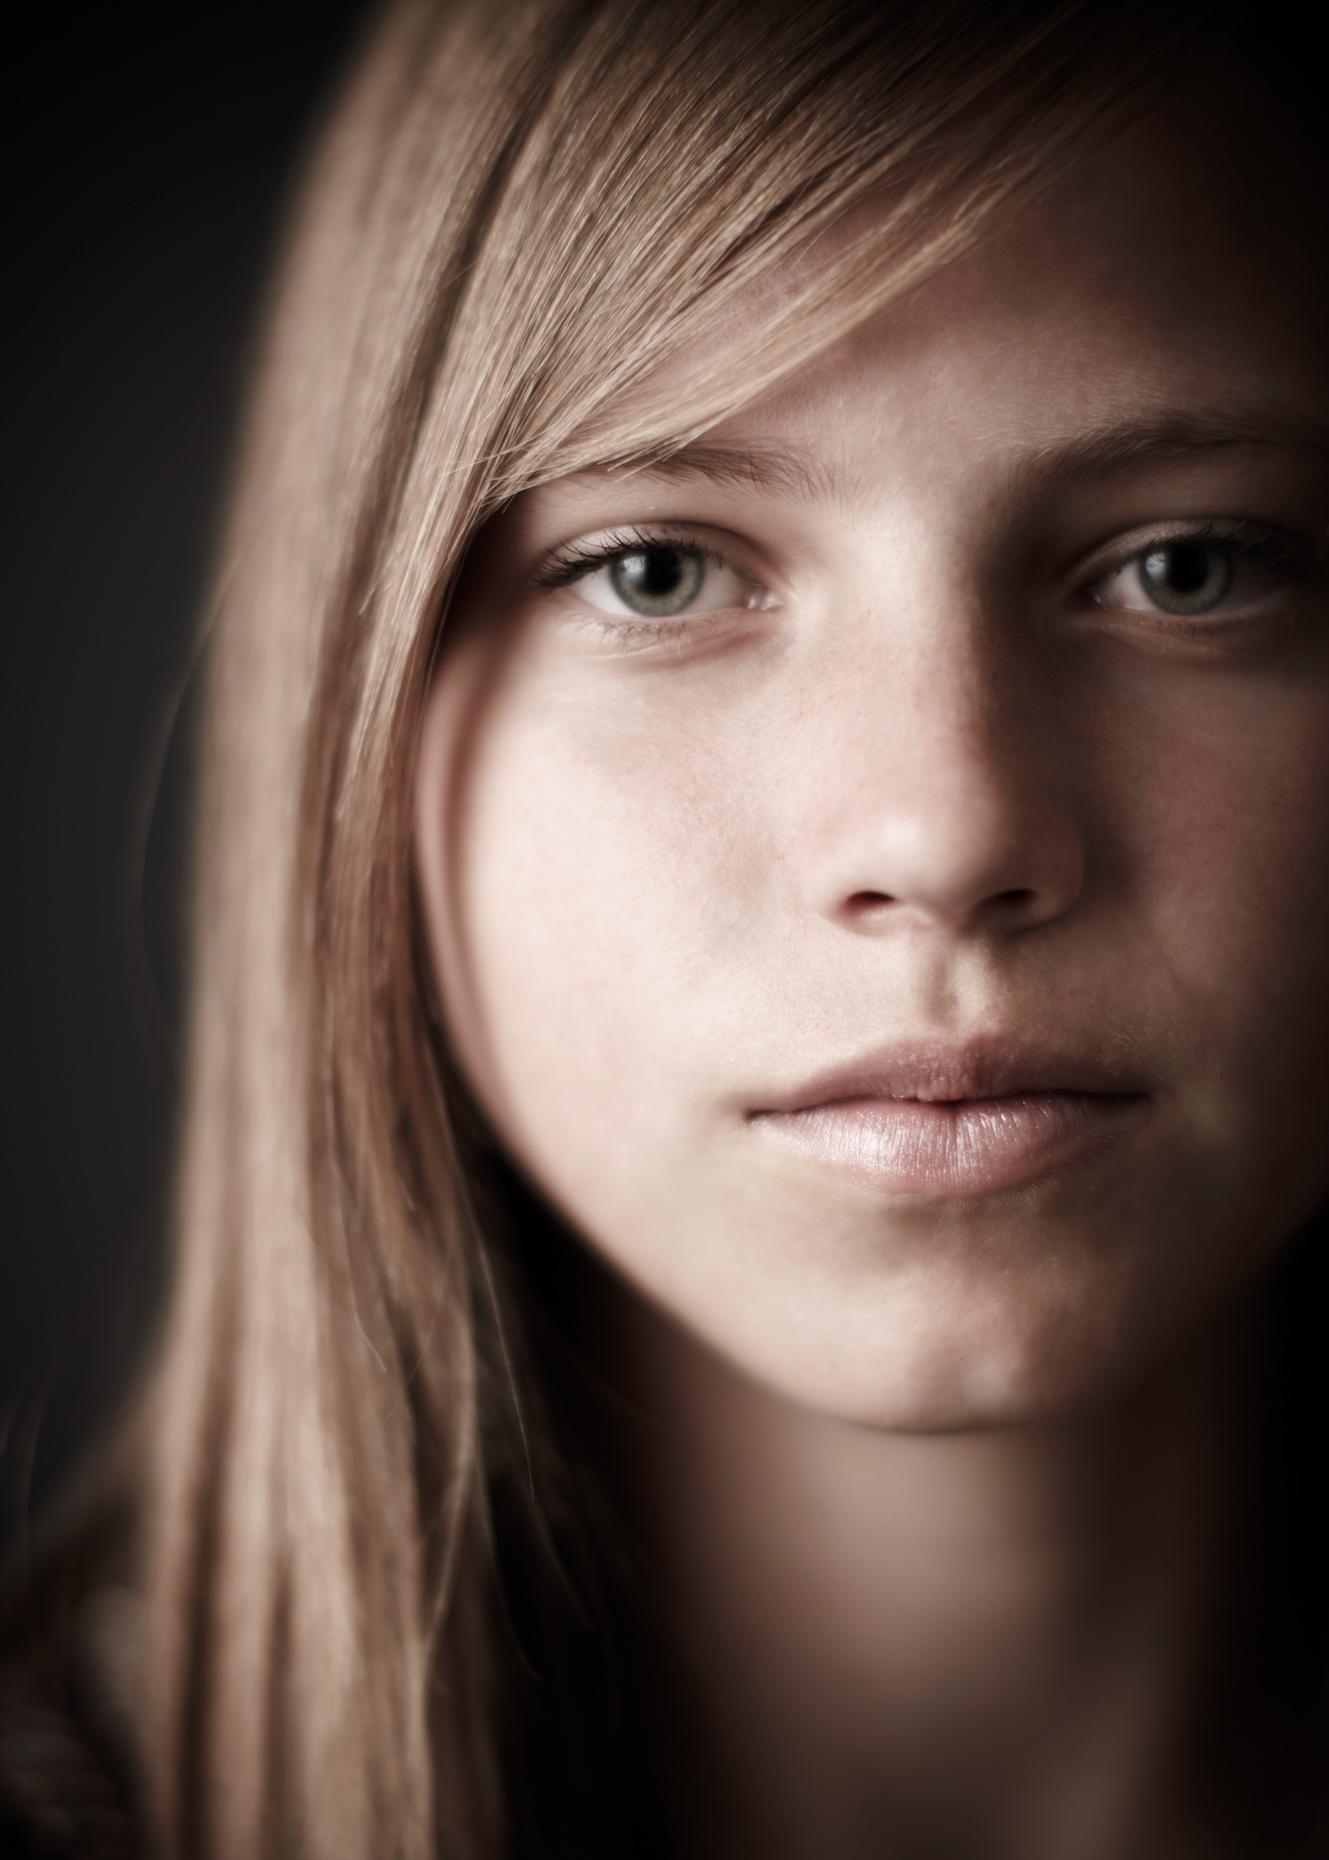 Portrait Photography Derek Israelsen Kid Blue Eyes